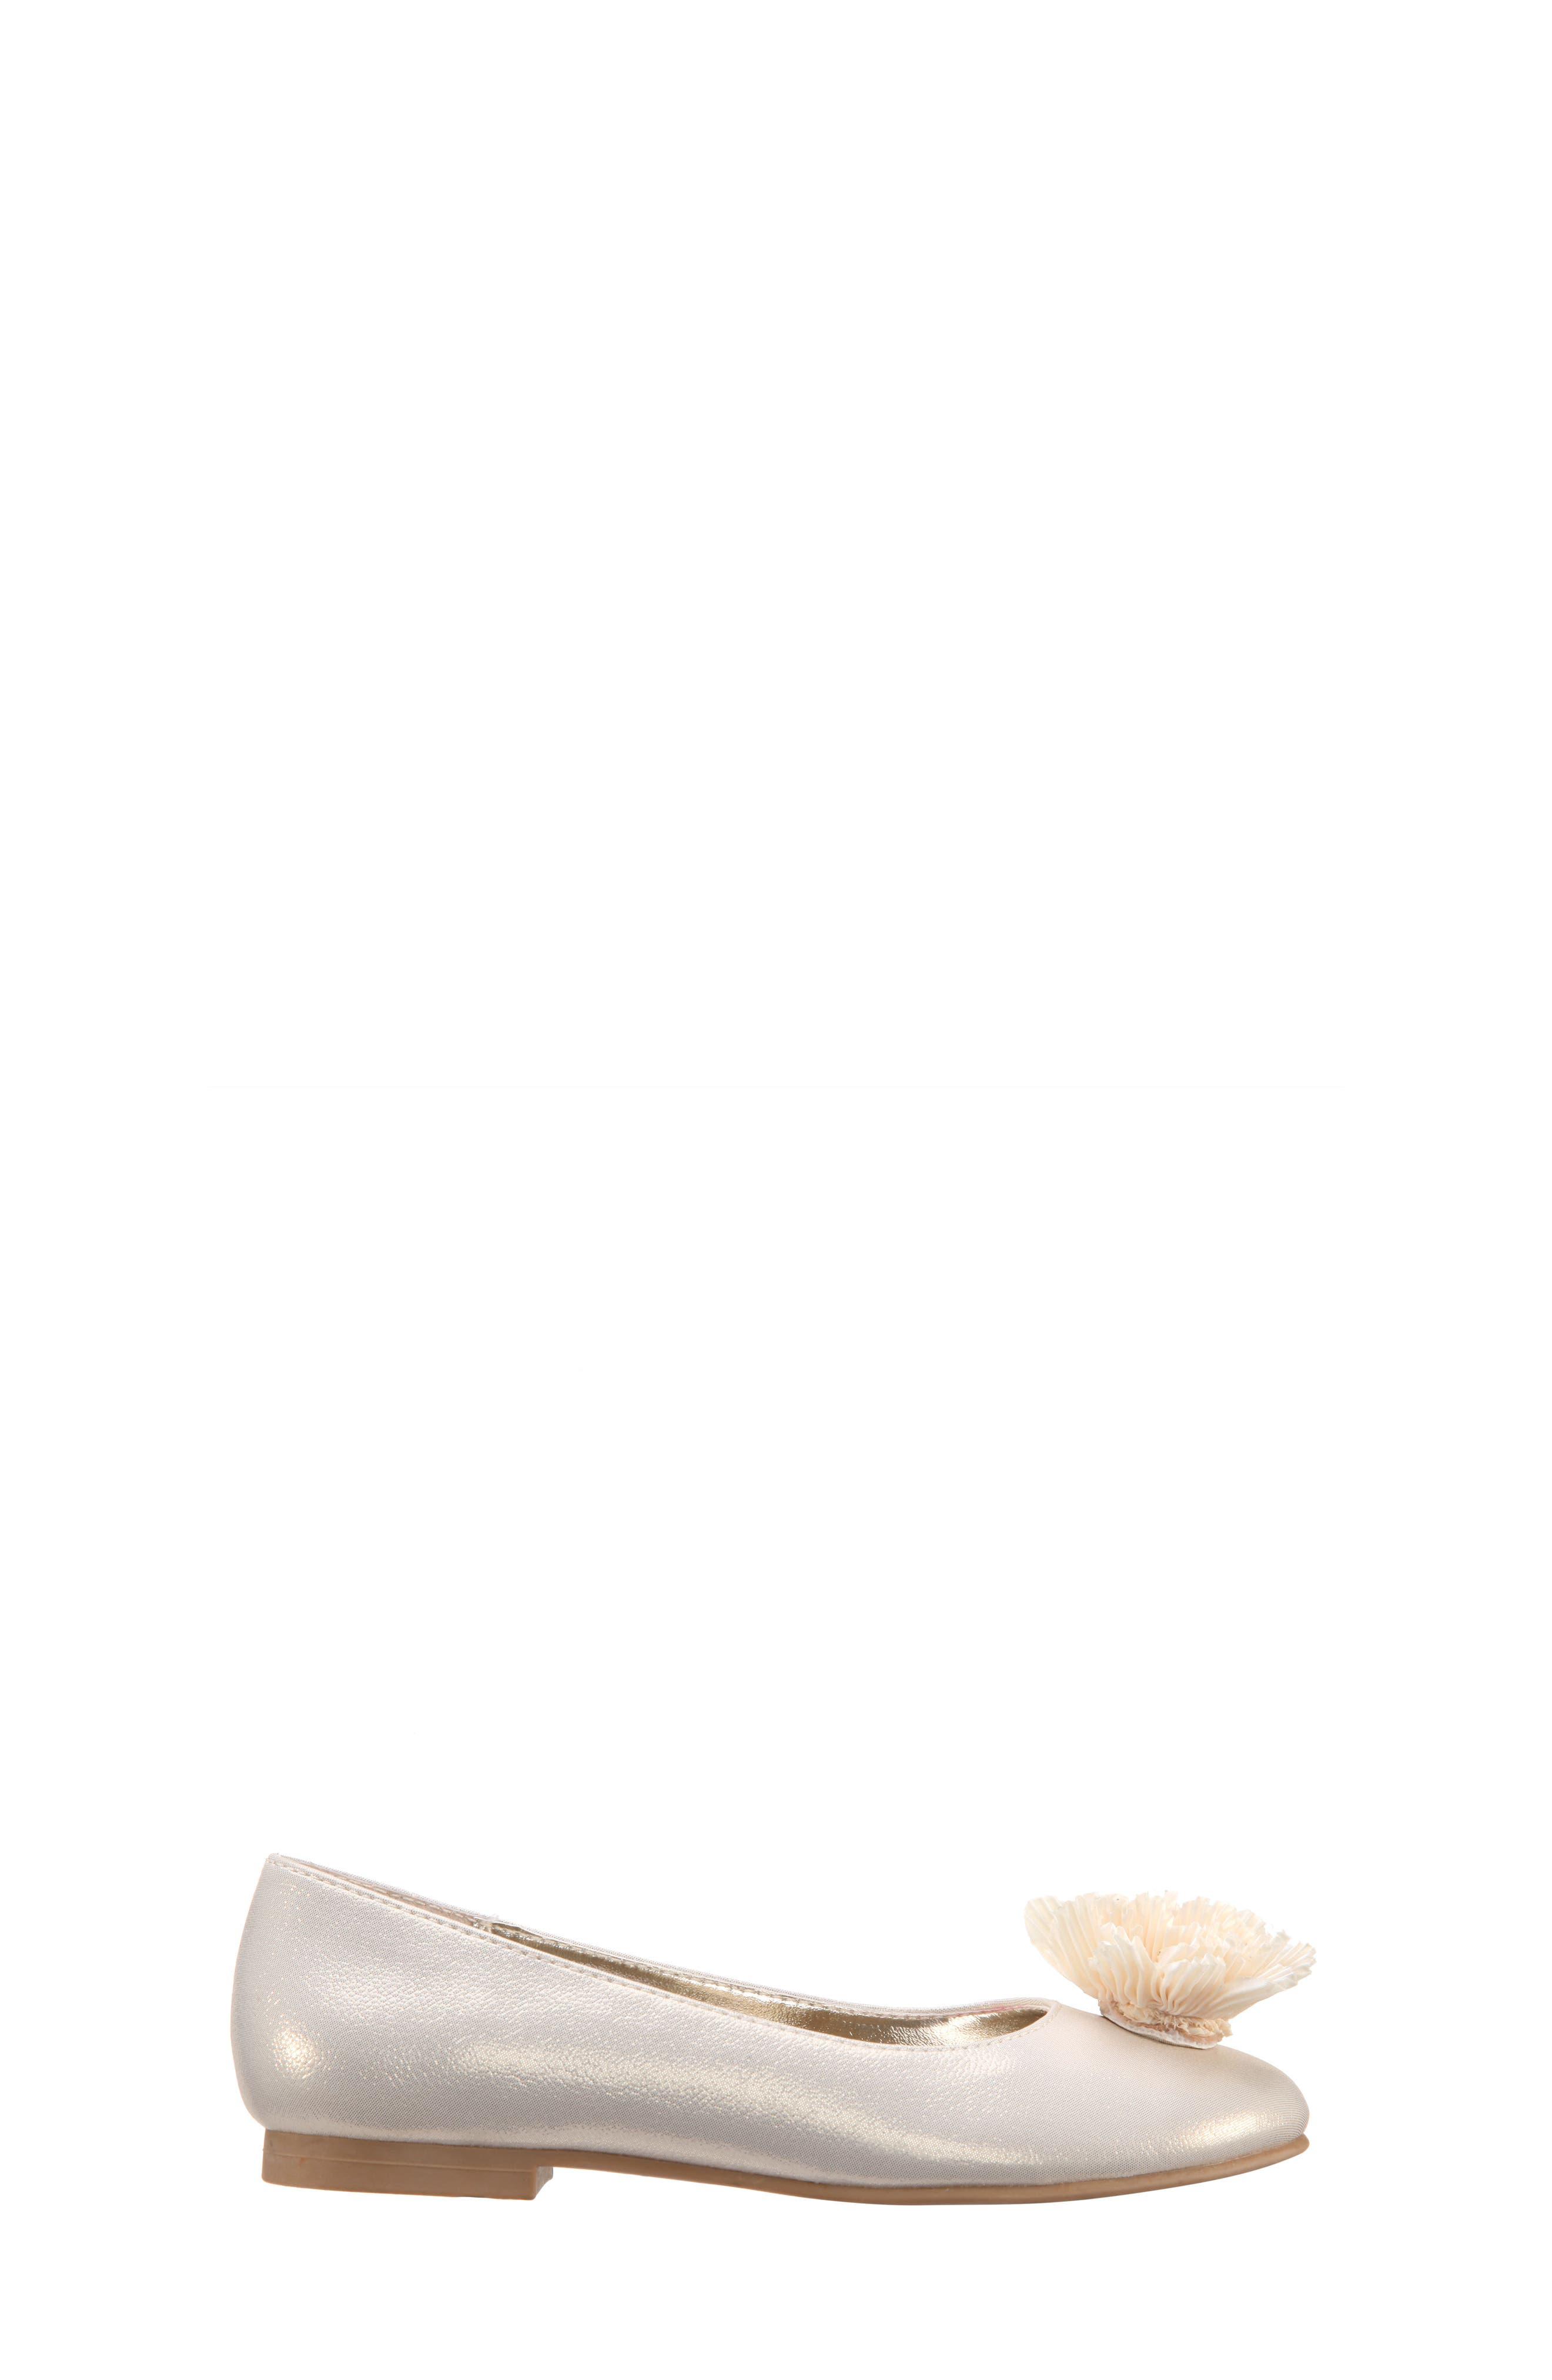 Jemma Flower Ballet Flat,                             Alternate thumbnail 3, color,                             Platino Metallic